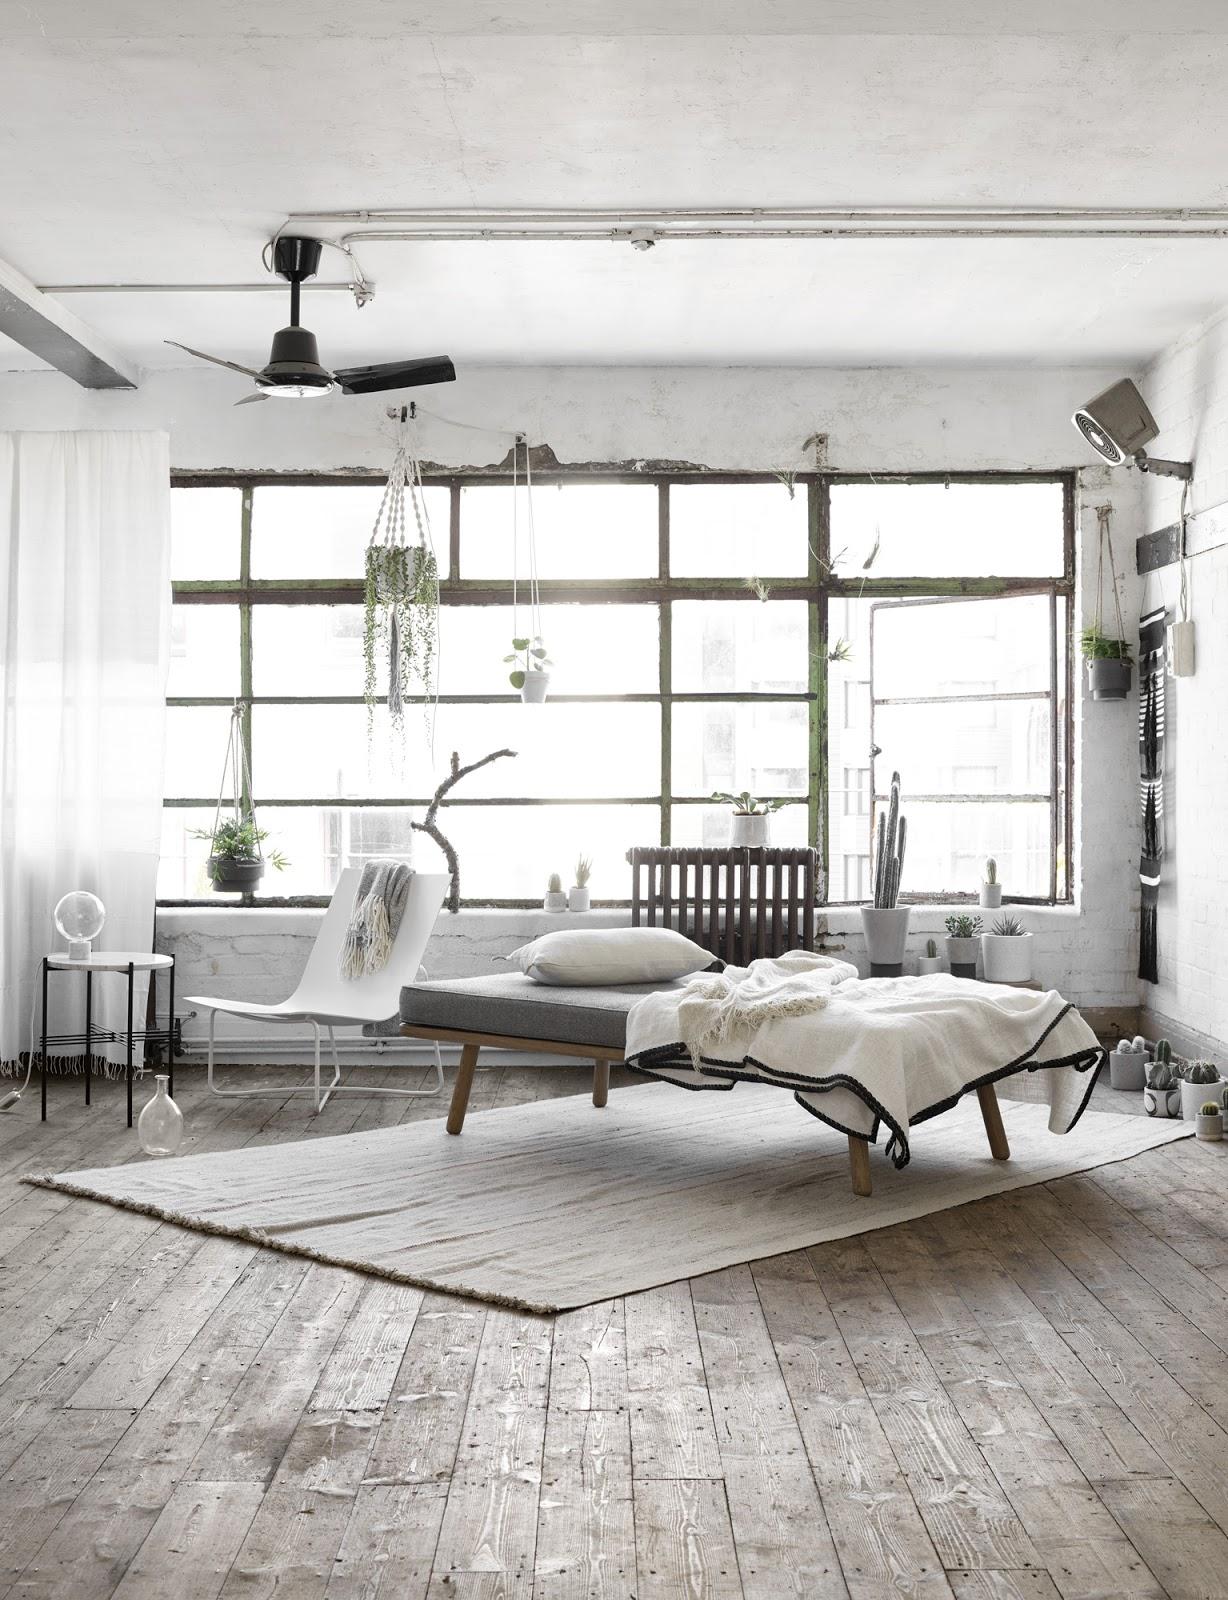 Green loft stile industriale piante e luce naturale for Arredamento stile industriale loft